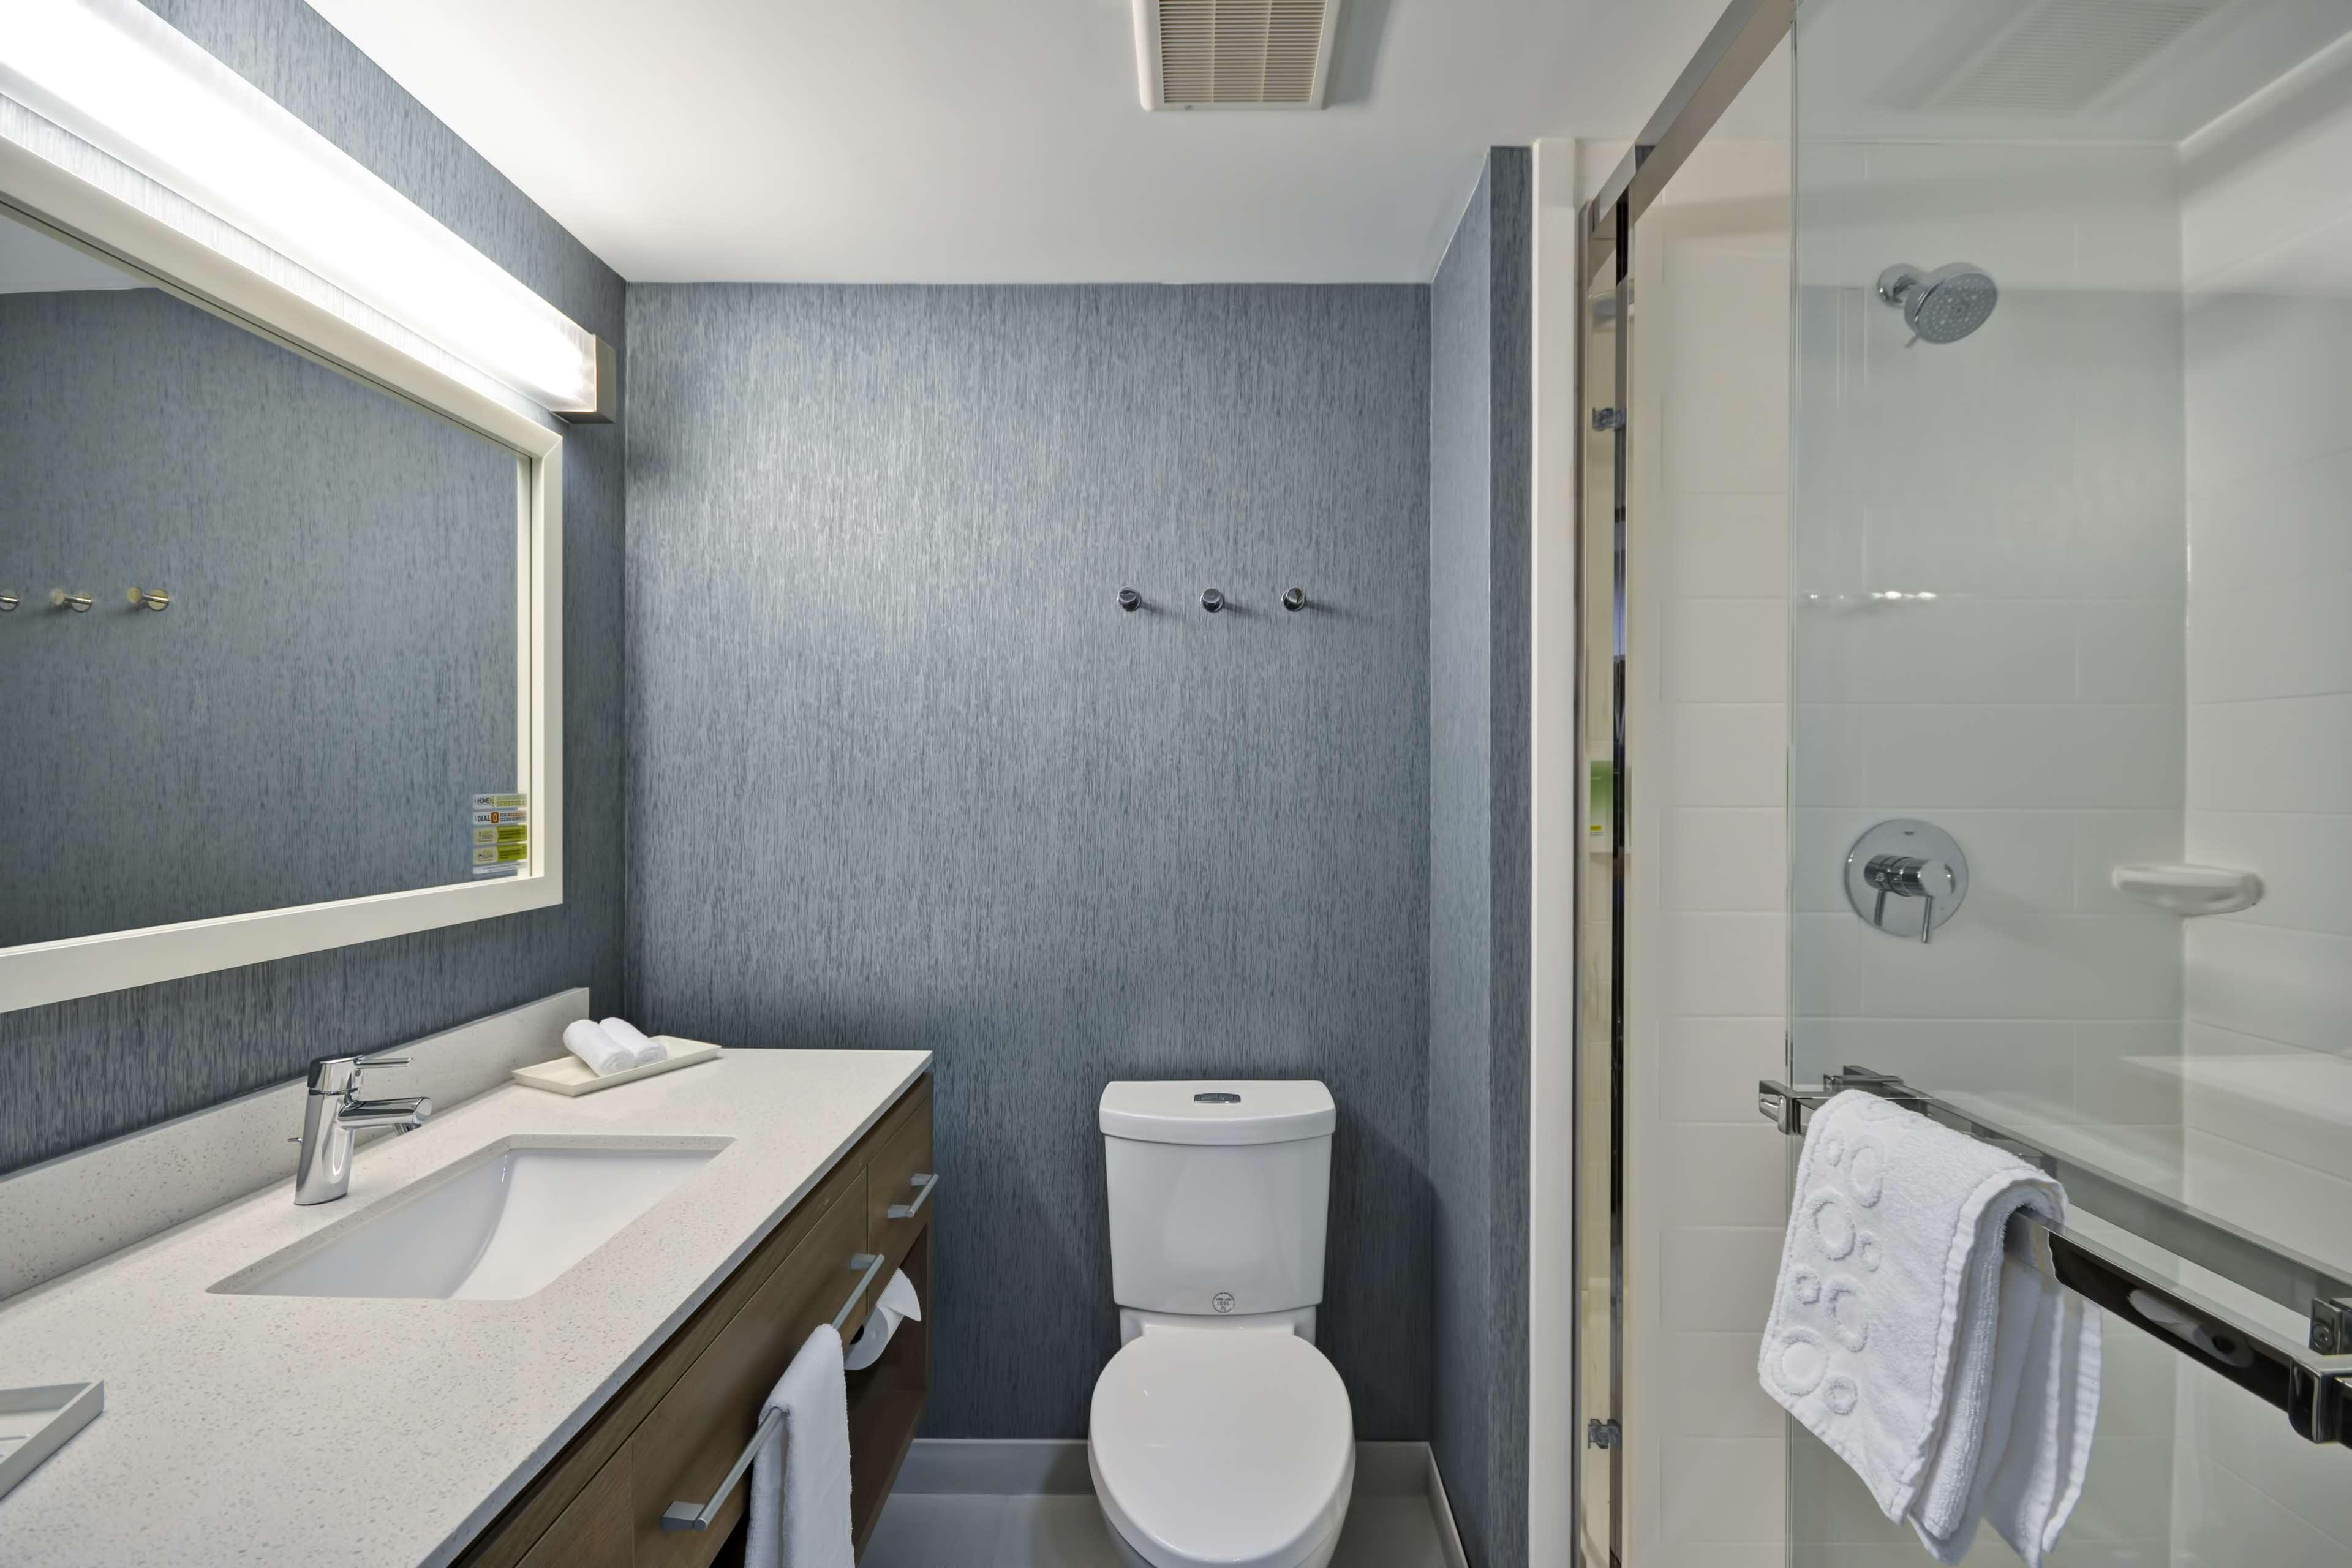 Home2 Suites by Hilton Jackson image 22